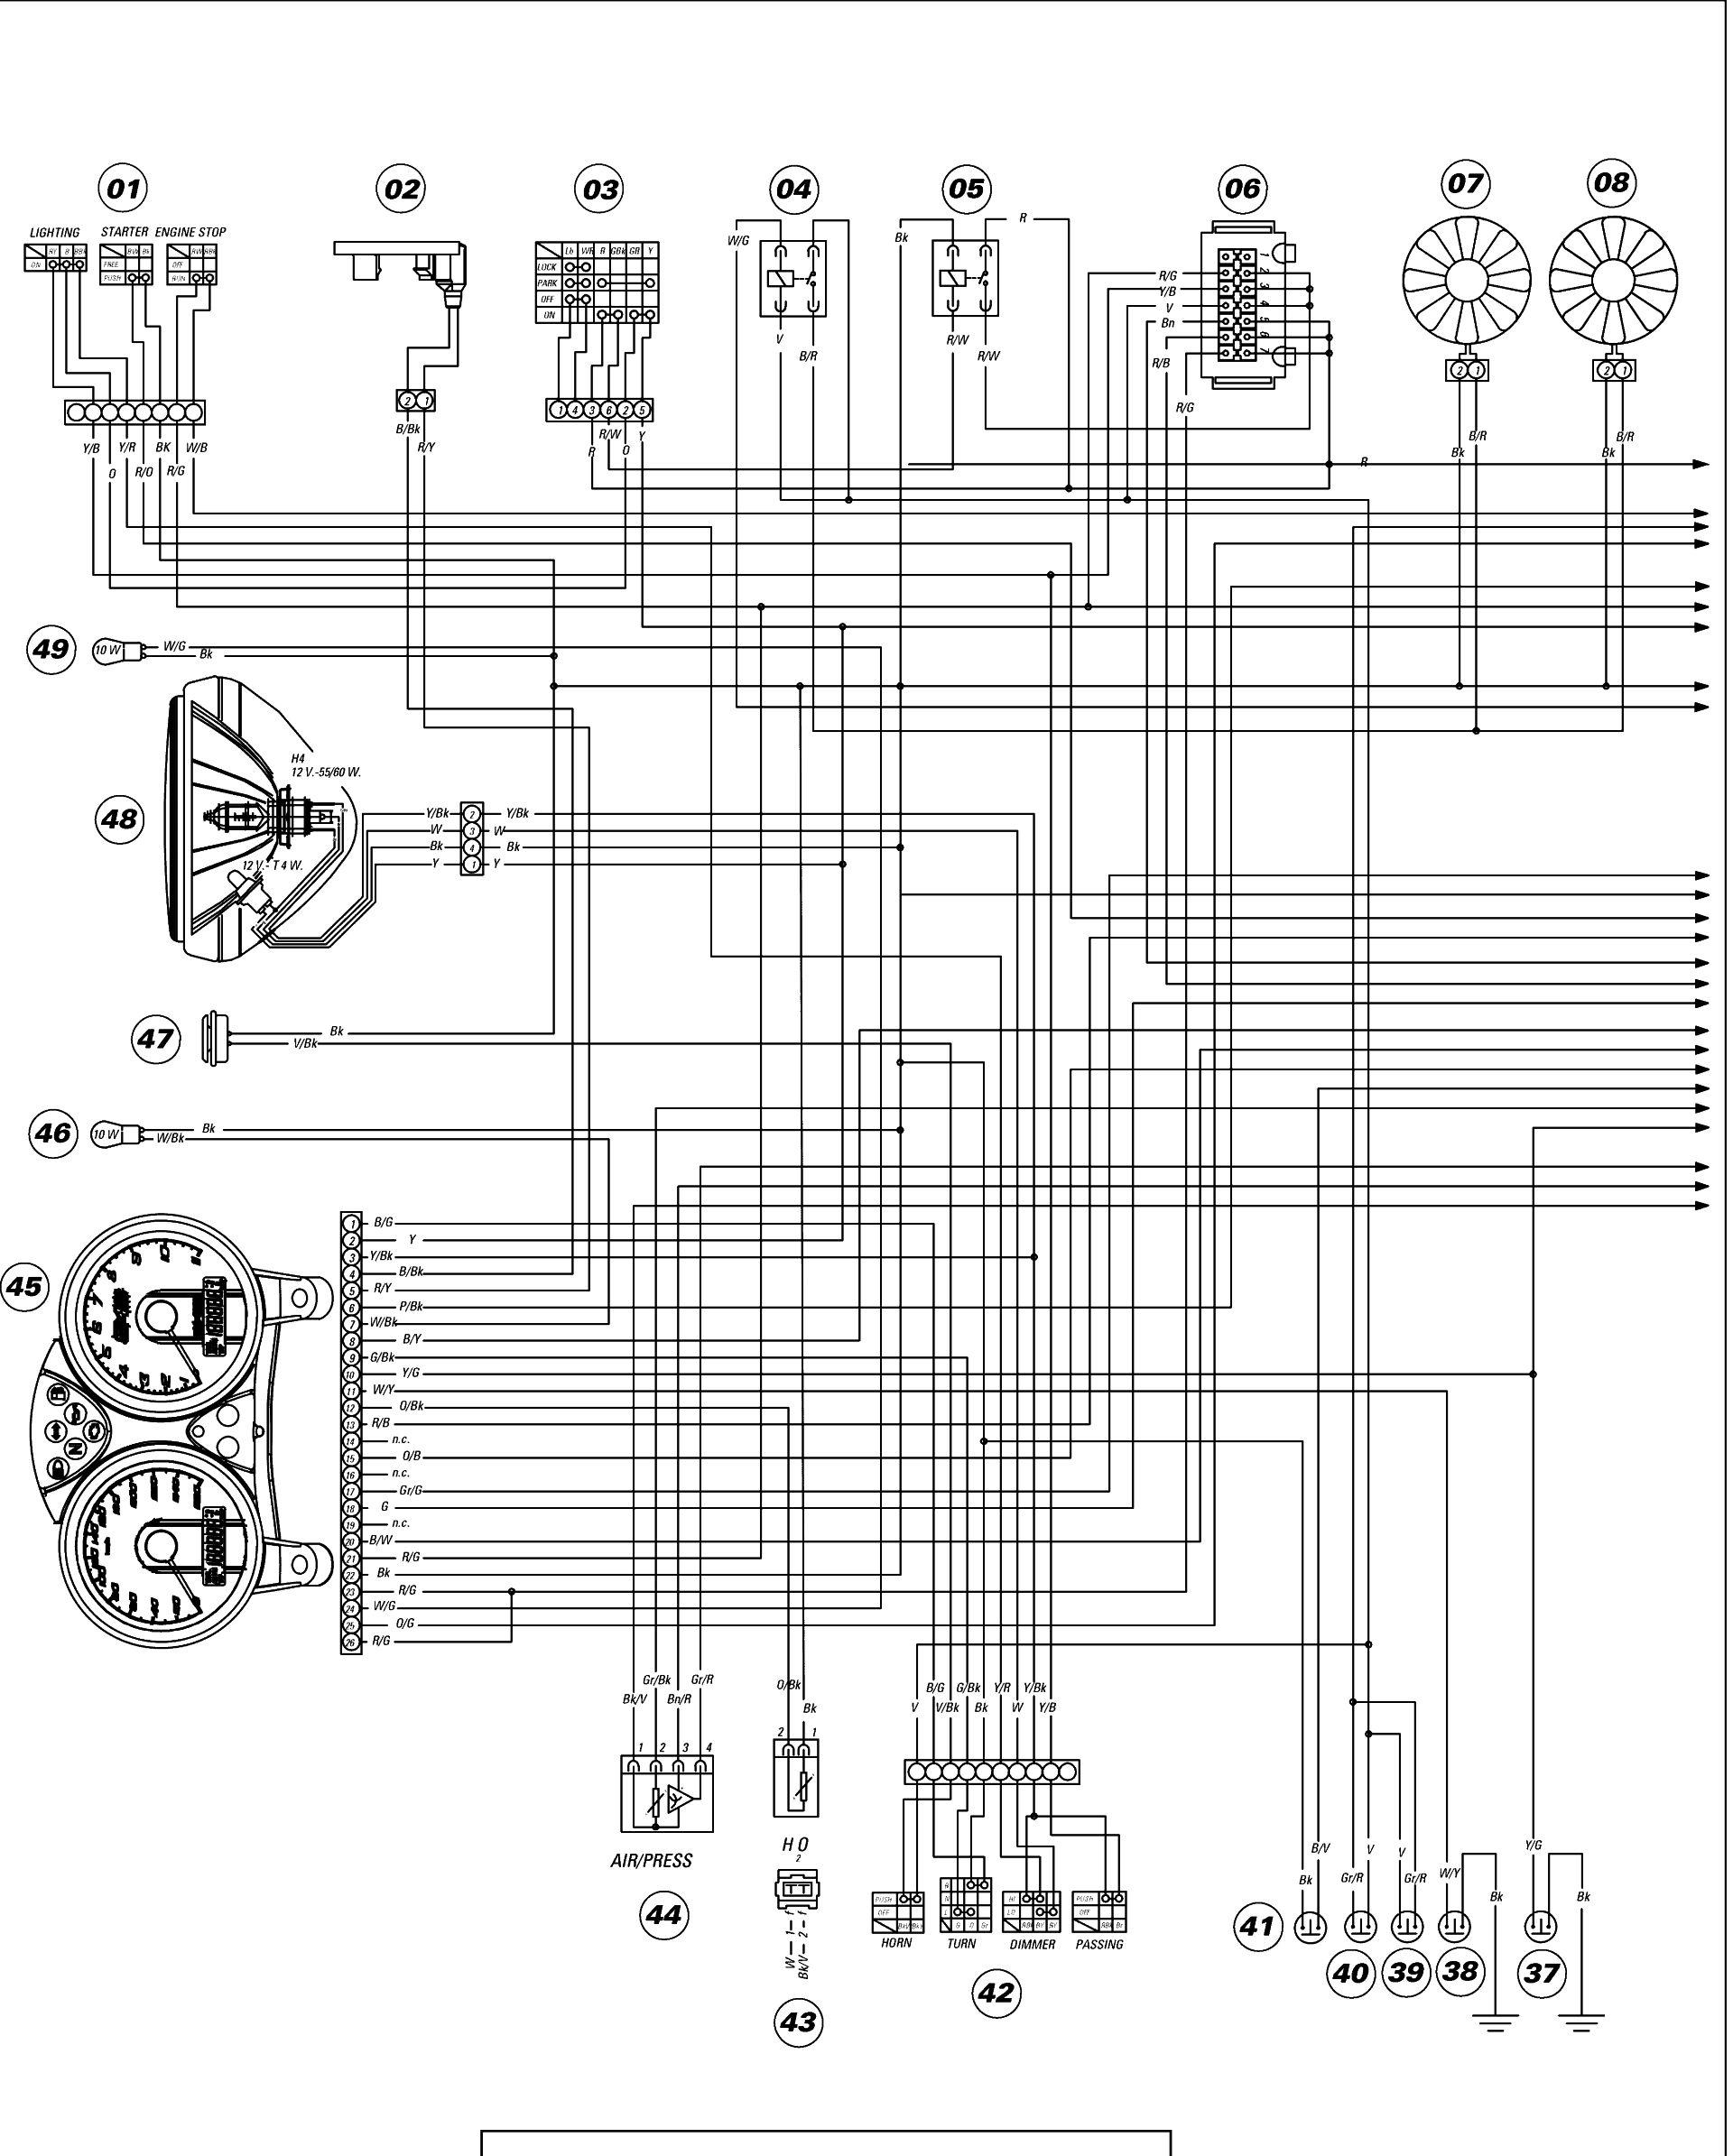 Magnificent Ducati Monster S4R 2004 Wiring Diagram Wiring Diagram Data Schema Wiring 101 Cranwise Assnl